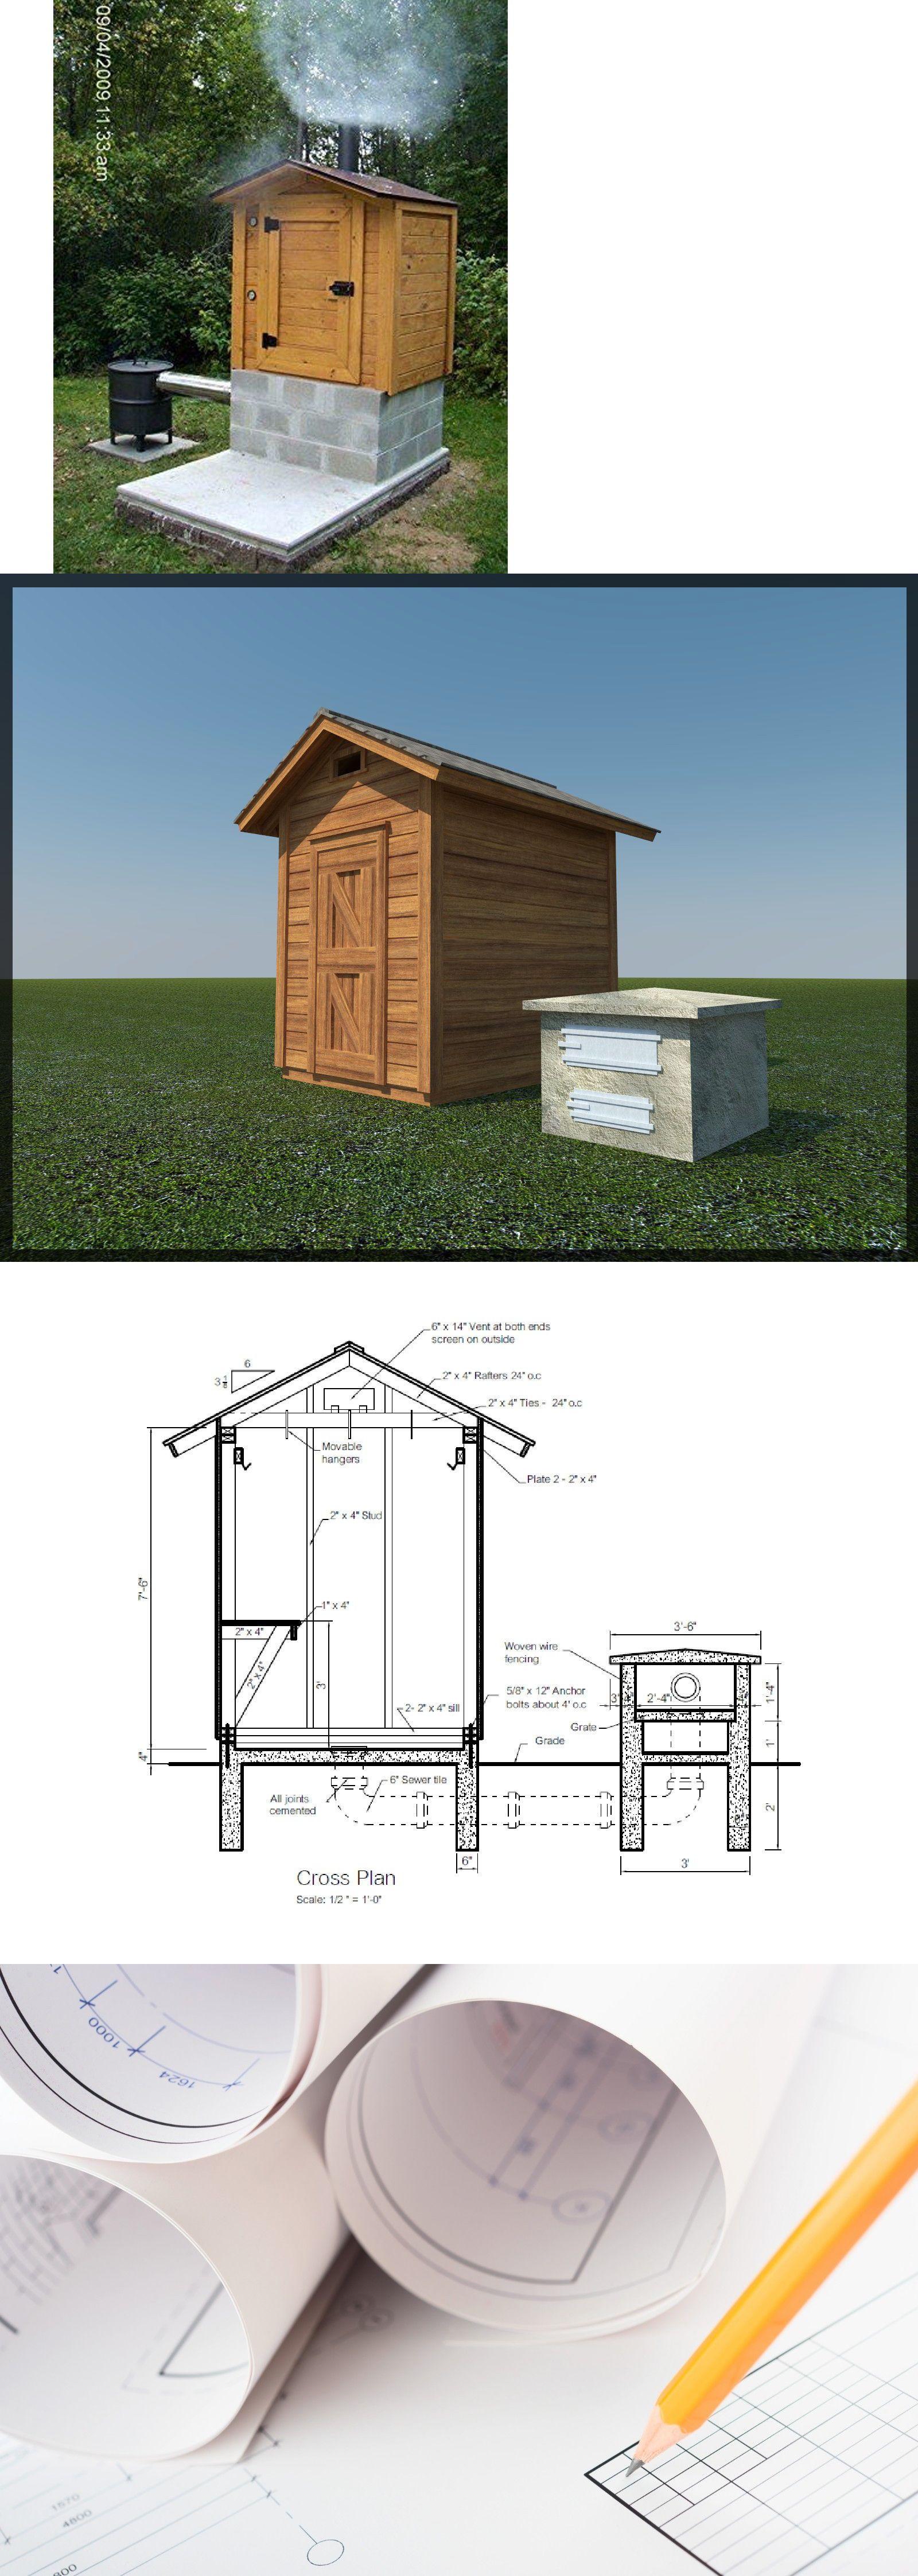 Building Plans and Blueprints 42130: Smokehouse Plans 8 X 6 ... on barn plans blueprints, garage plans blueprints, shed plans blueprints, pig roaster plans blueprints, windmill plans blueprints,